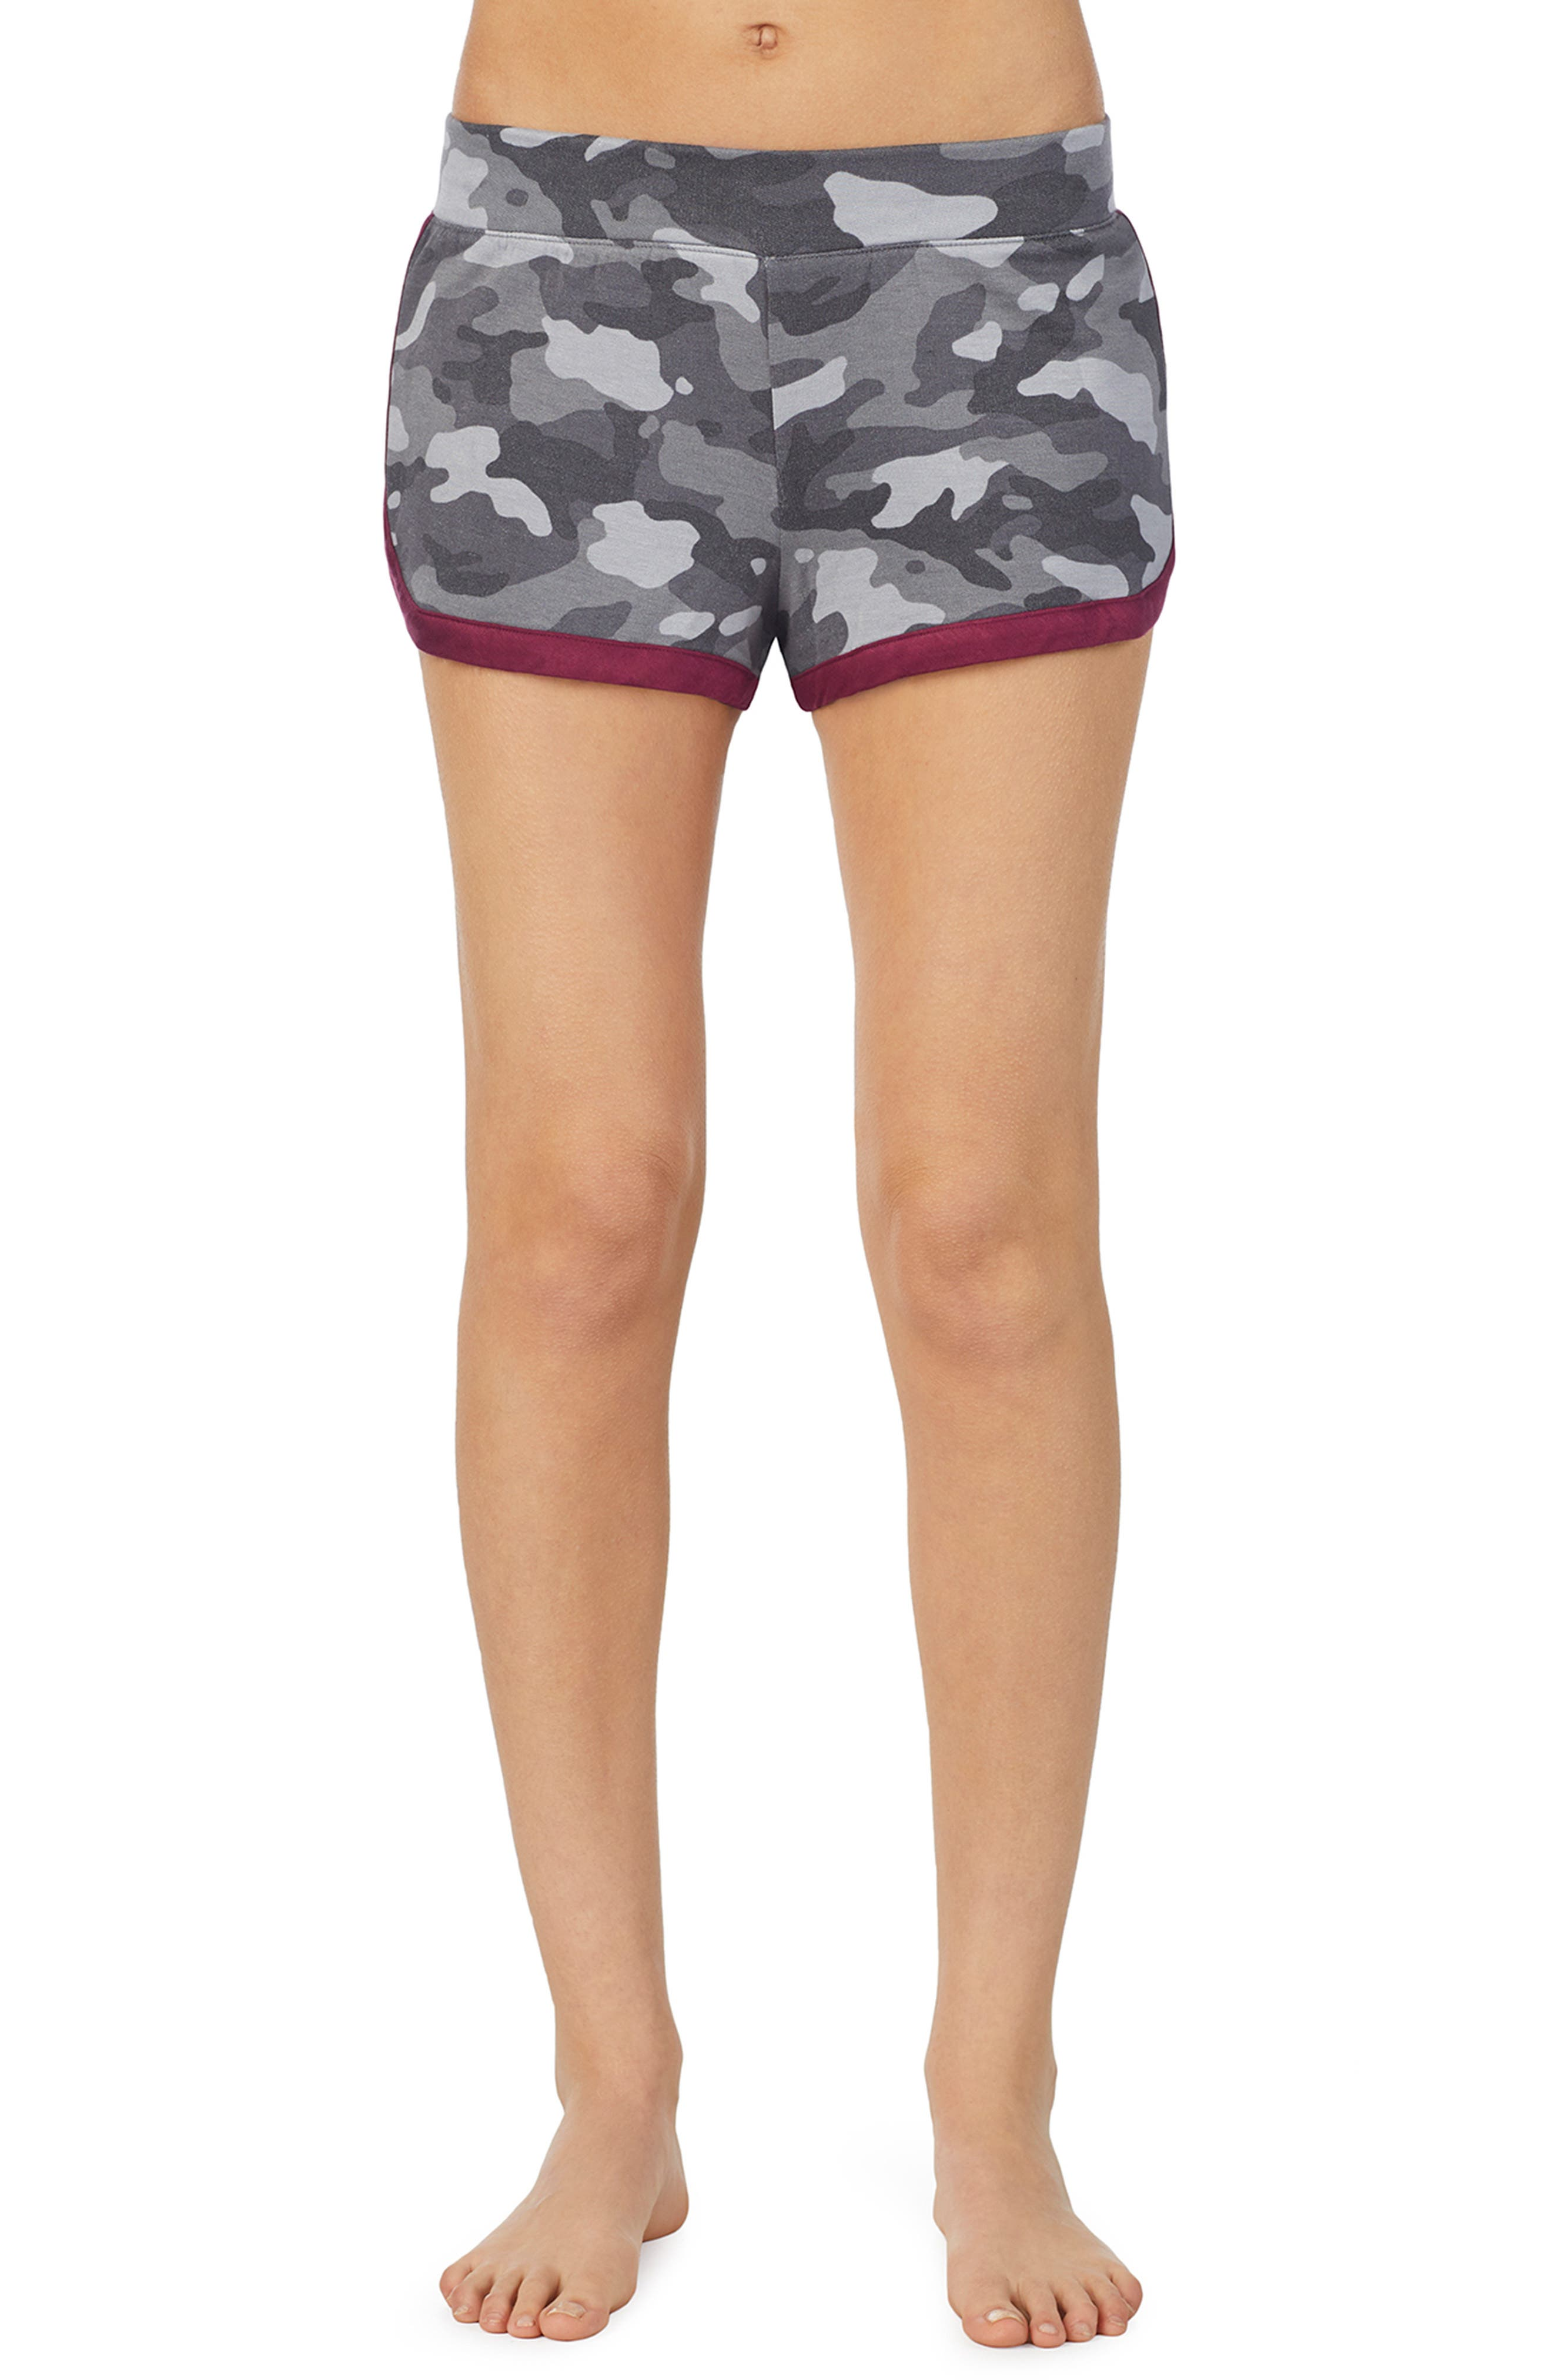 Lounge Shorts,                             Main thumbnail 1, color,                             Grey Prt